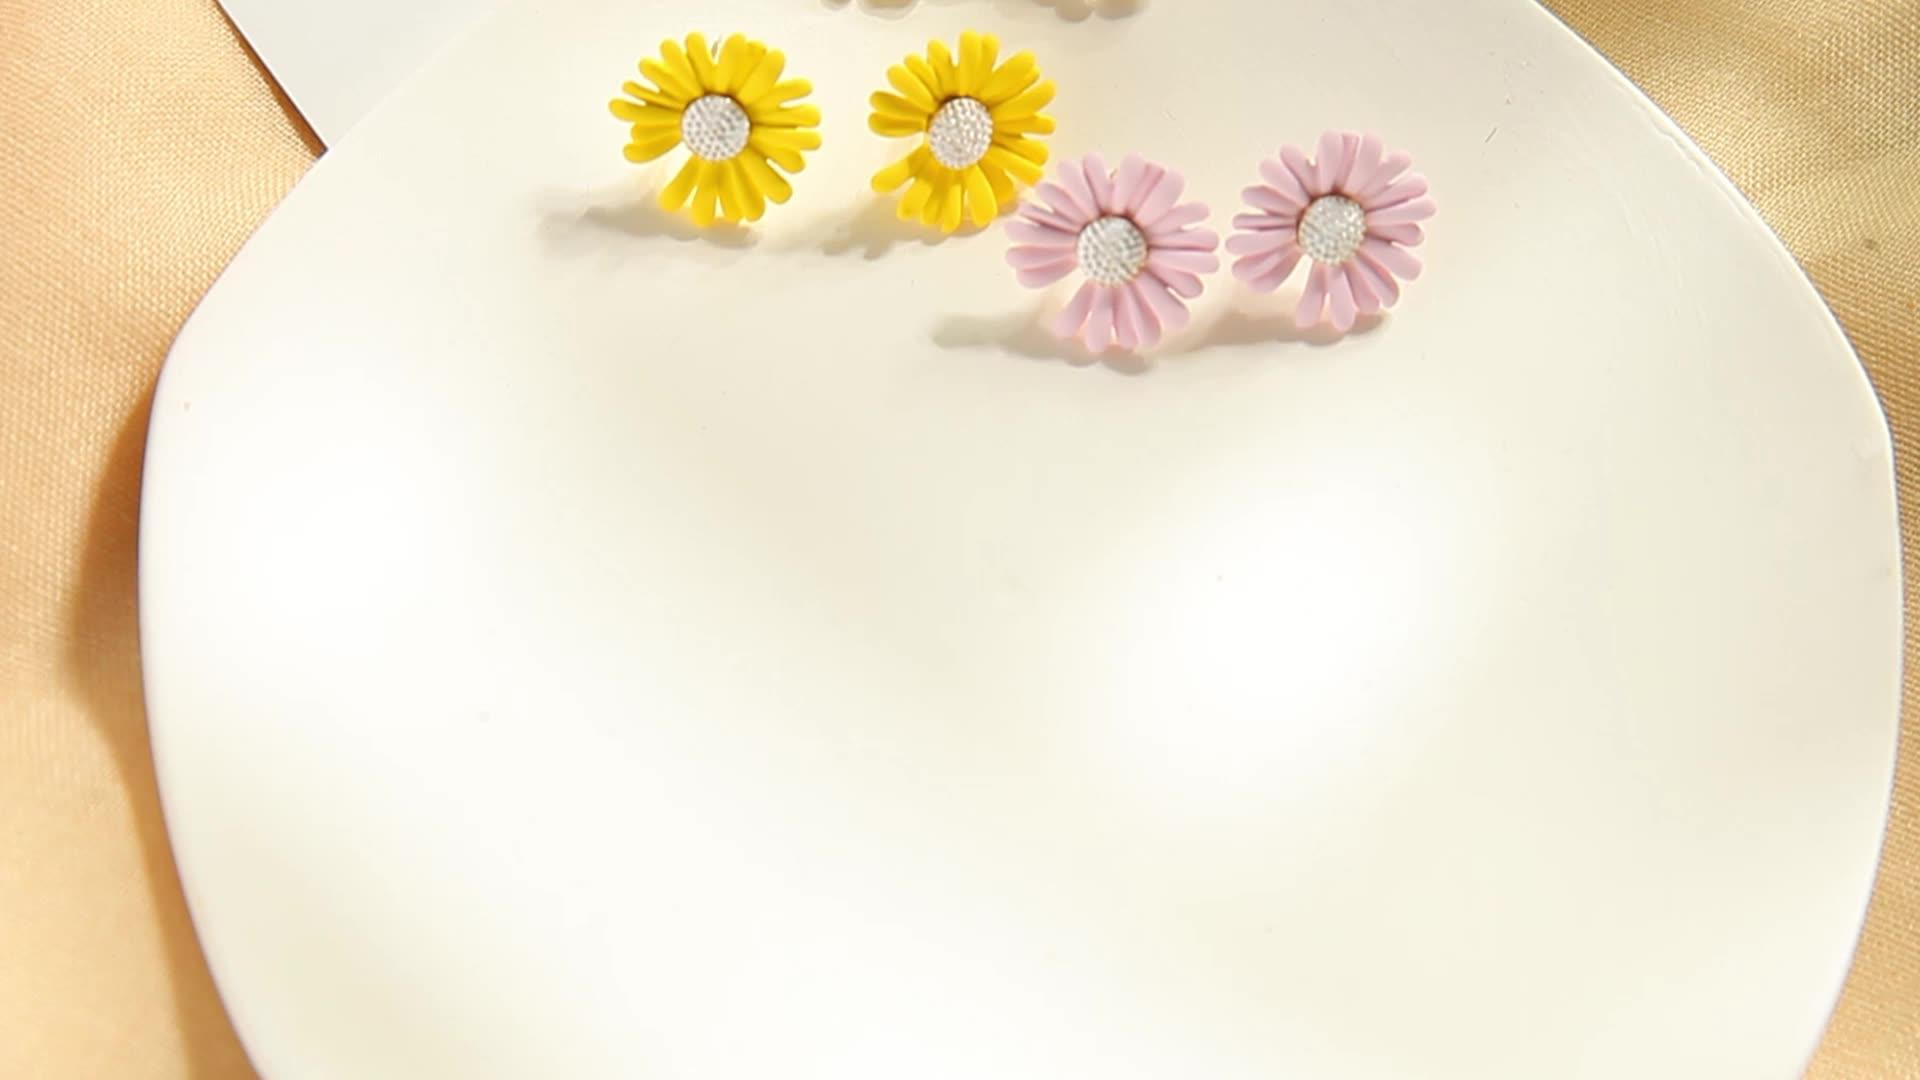 E0403 2020 เกาหลี Hot Kpop Star GD ที่ดีที่สุดดอกไม้ลบ One กลีบ Peace ผู้หญิงบริสุทธิ์เครื่องประดับ Daisy ต่างหู